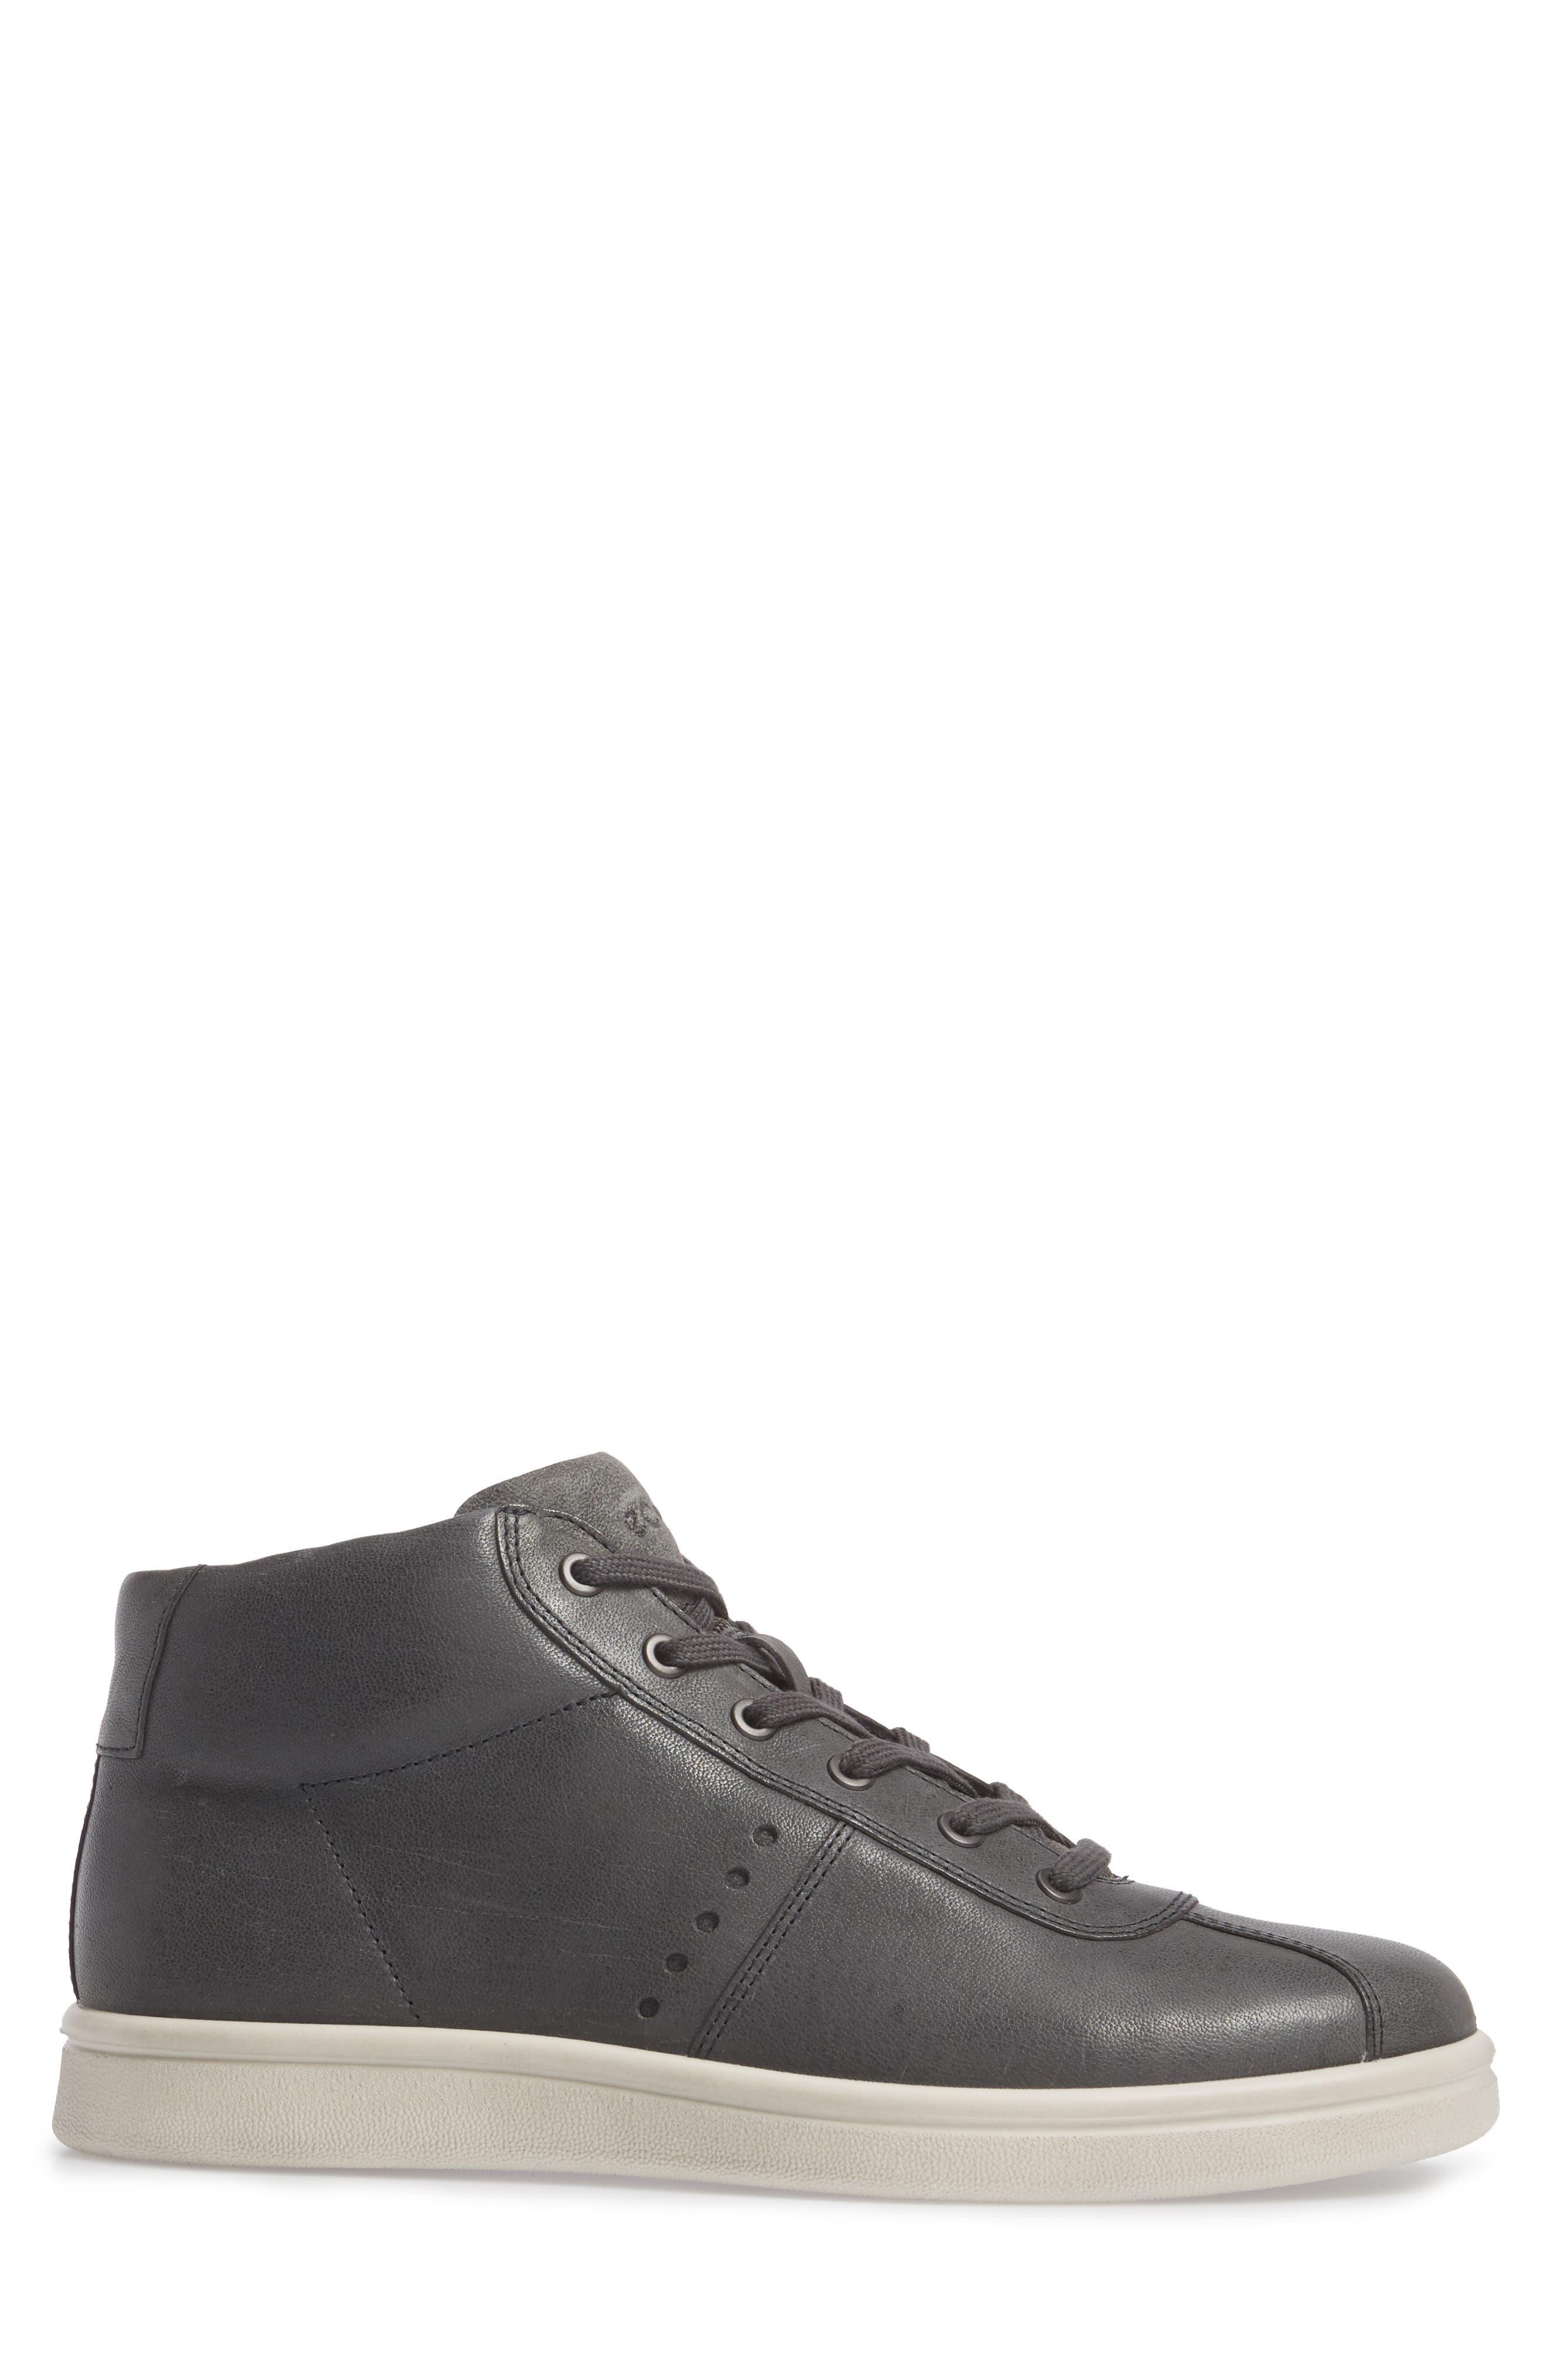 Kallum High Top Sneaker,                             Alternate thumbnail 3, color,                             Moonless Leather